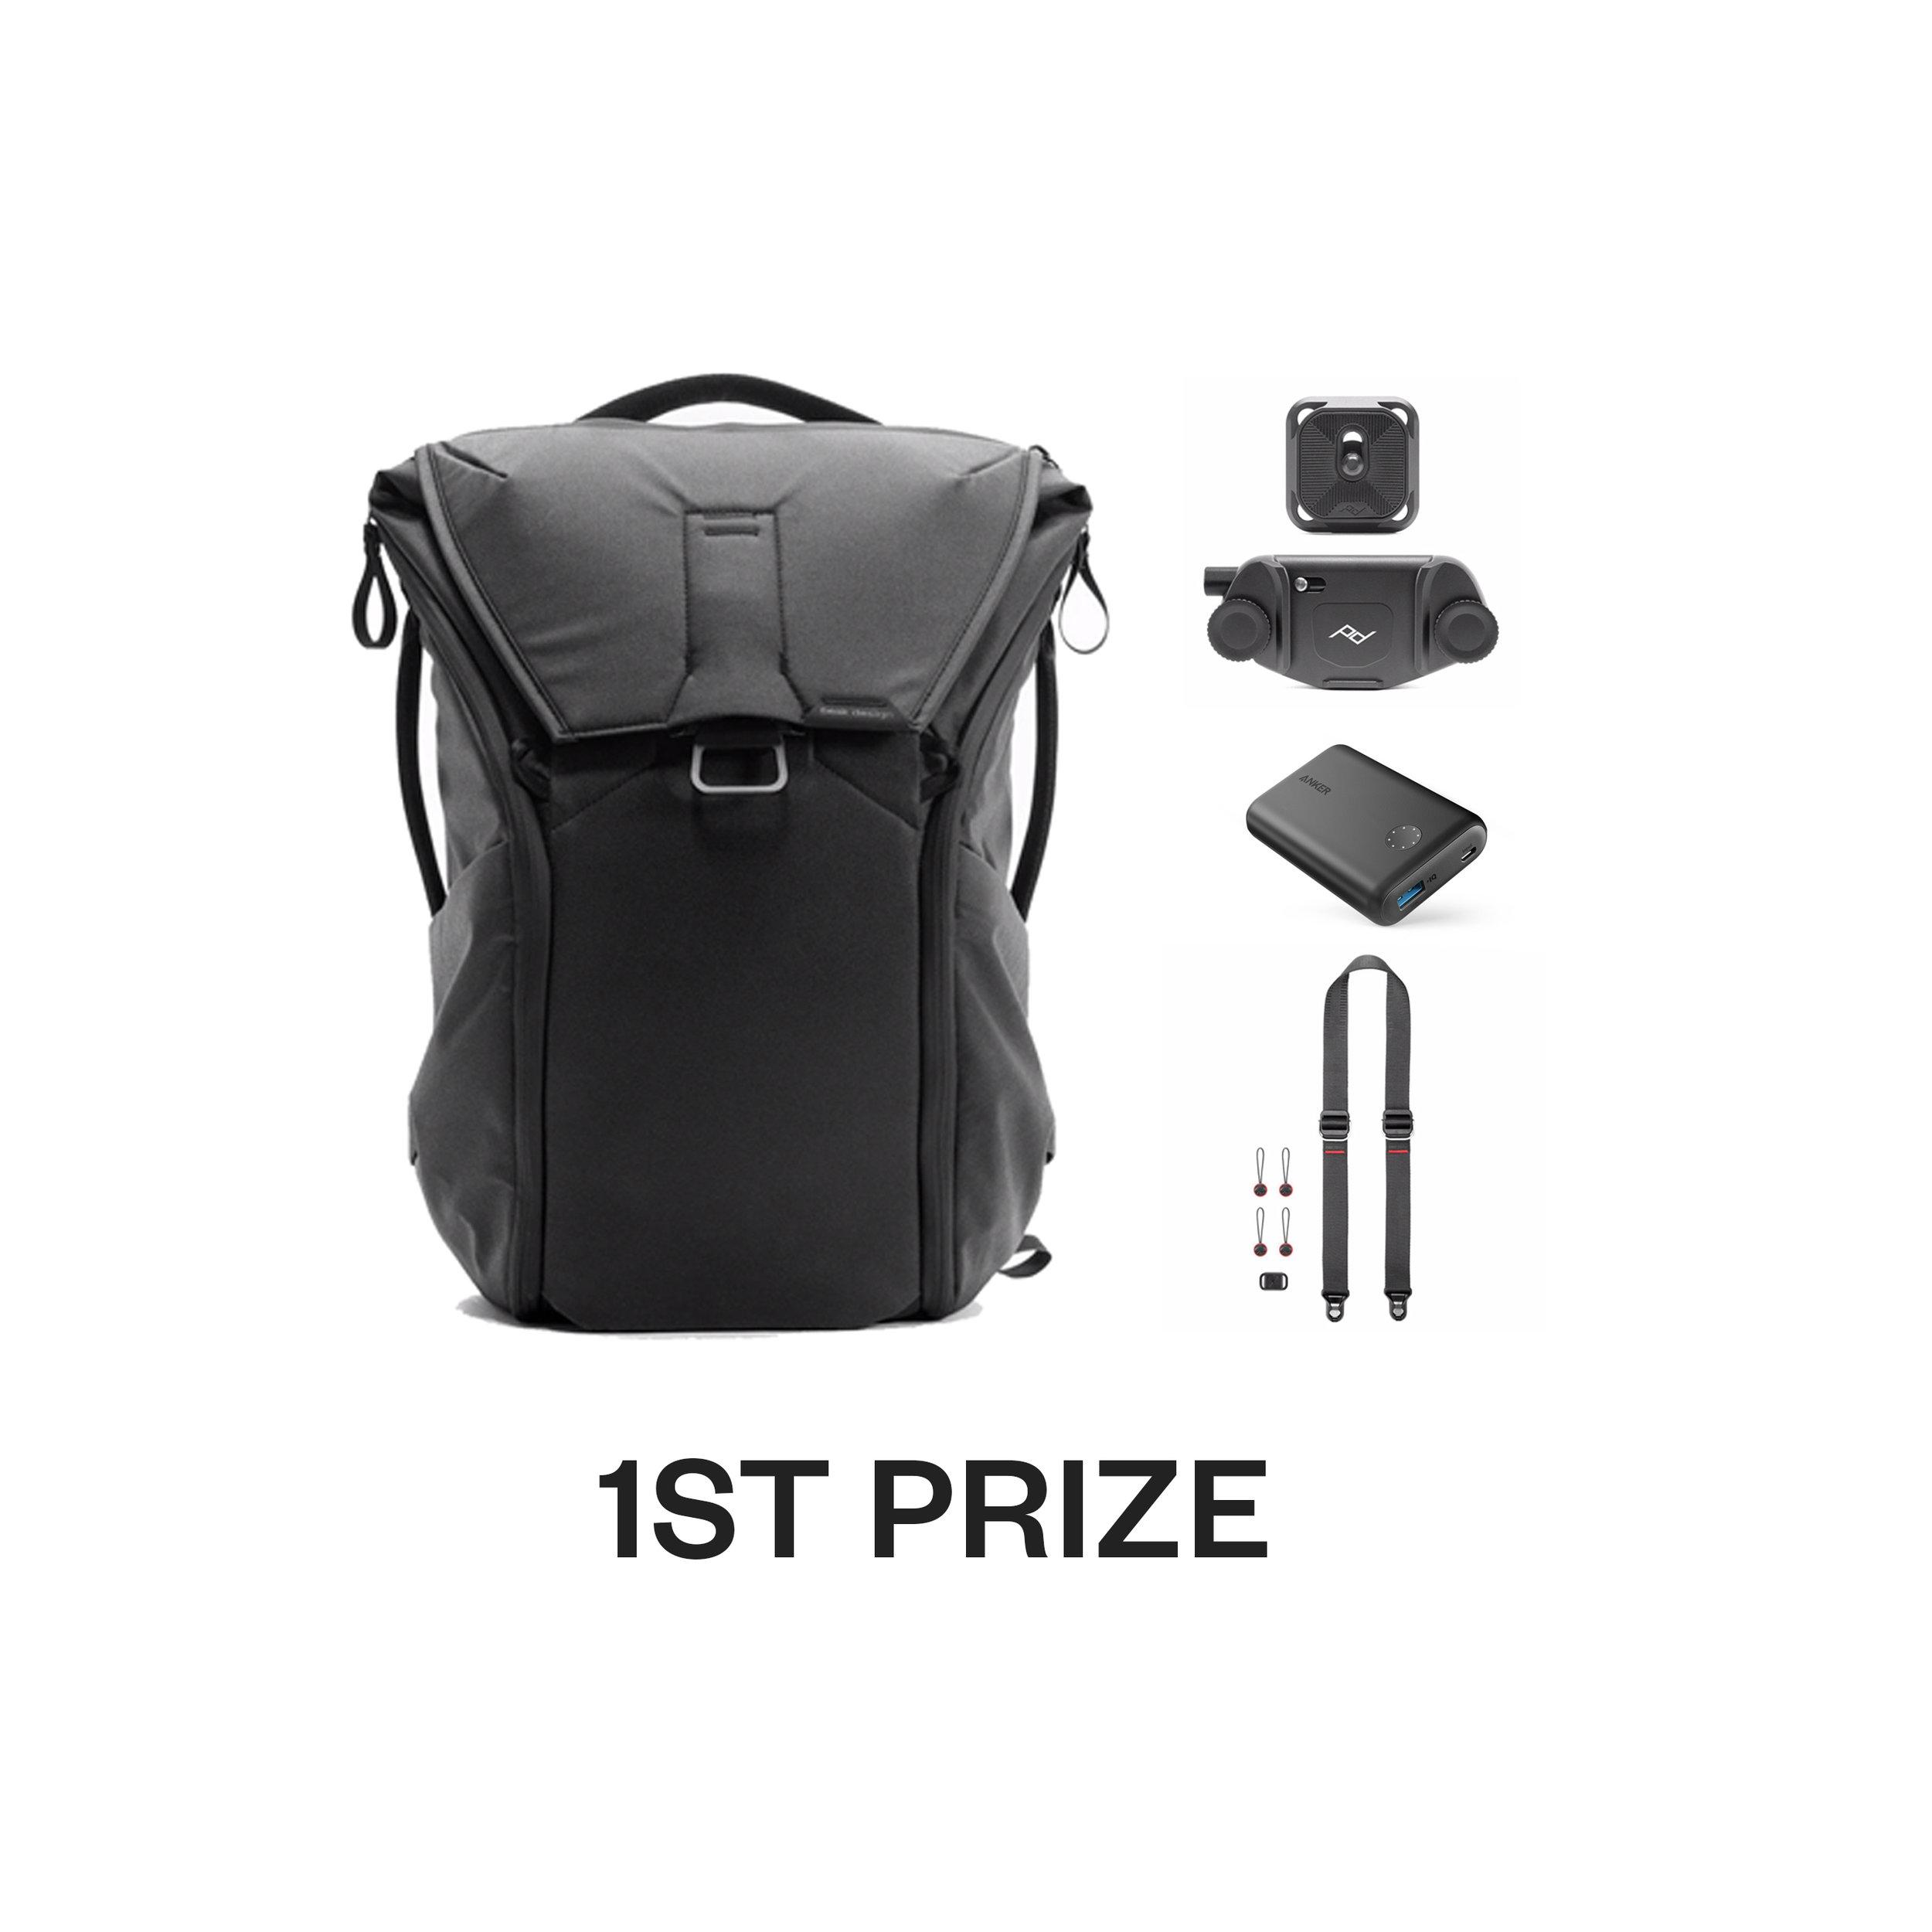 1st prize - Peak Design Urban Kit including:Everyday Backpack (Black)Slide lite Camera StrapCapture Camera ClipAnker PowerCore II 10,000mAh portable battery